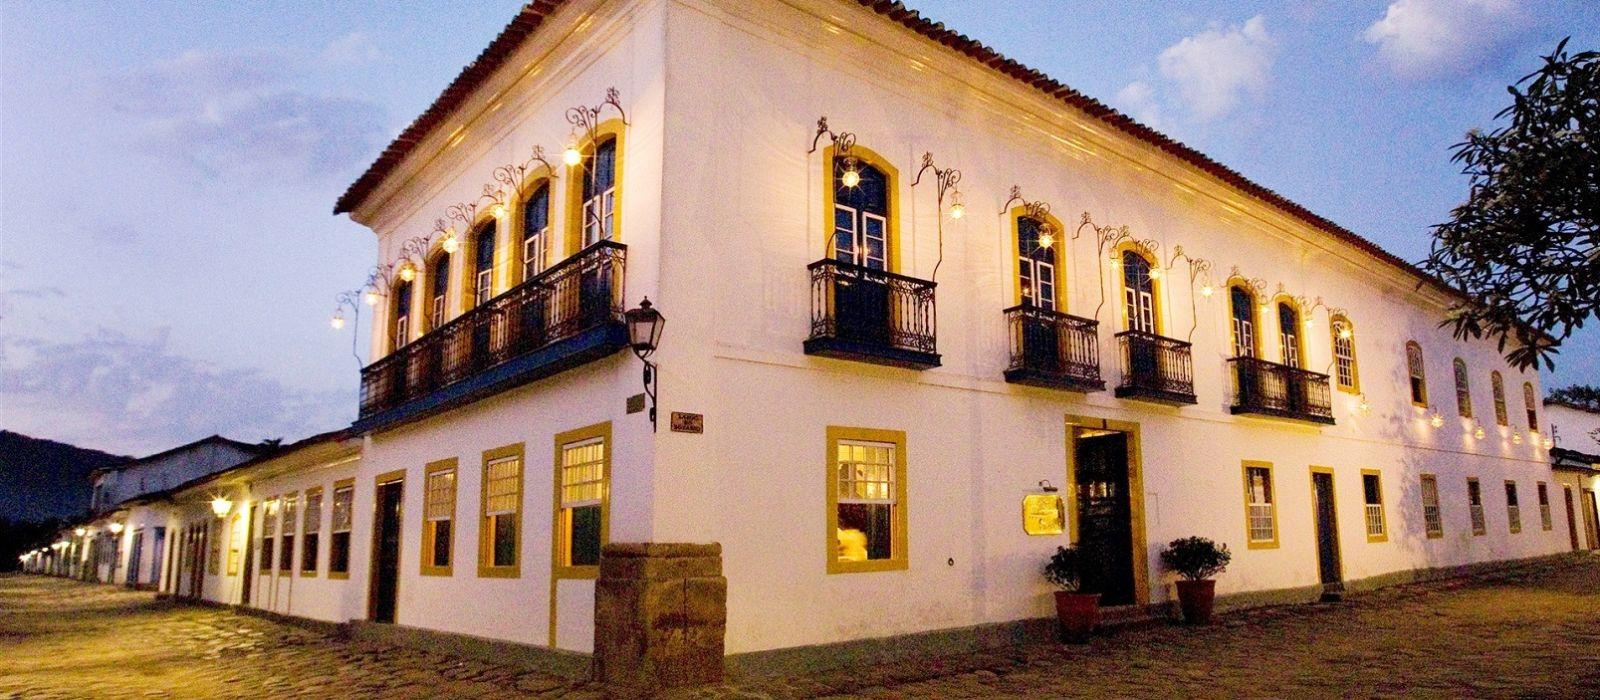 Hotel Pousada do Sandi Brasilien